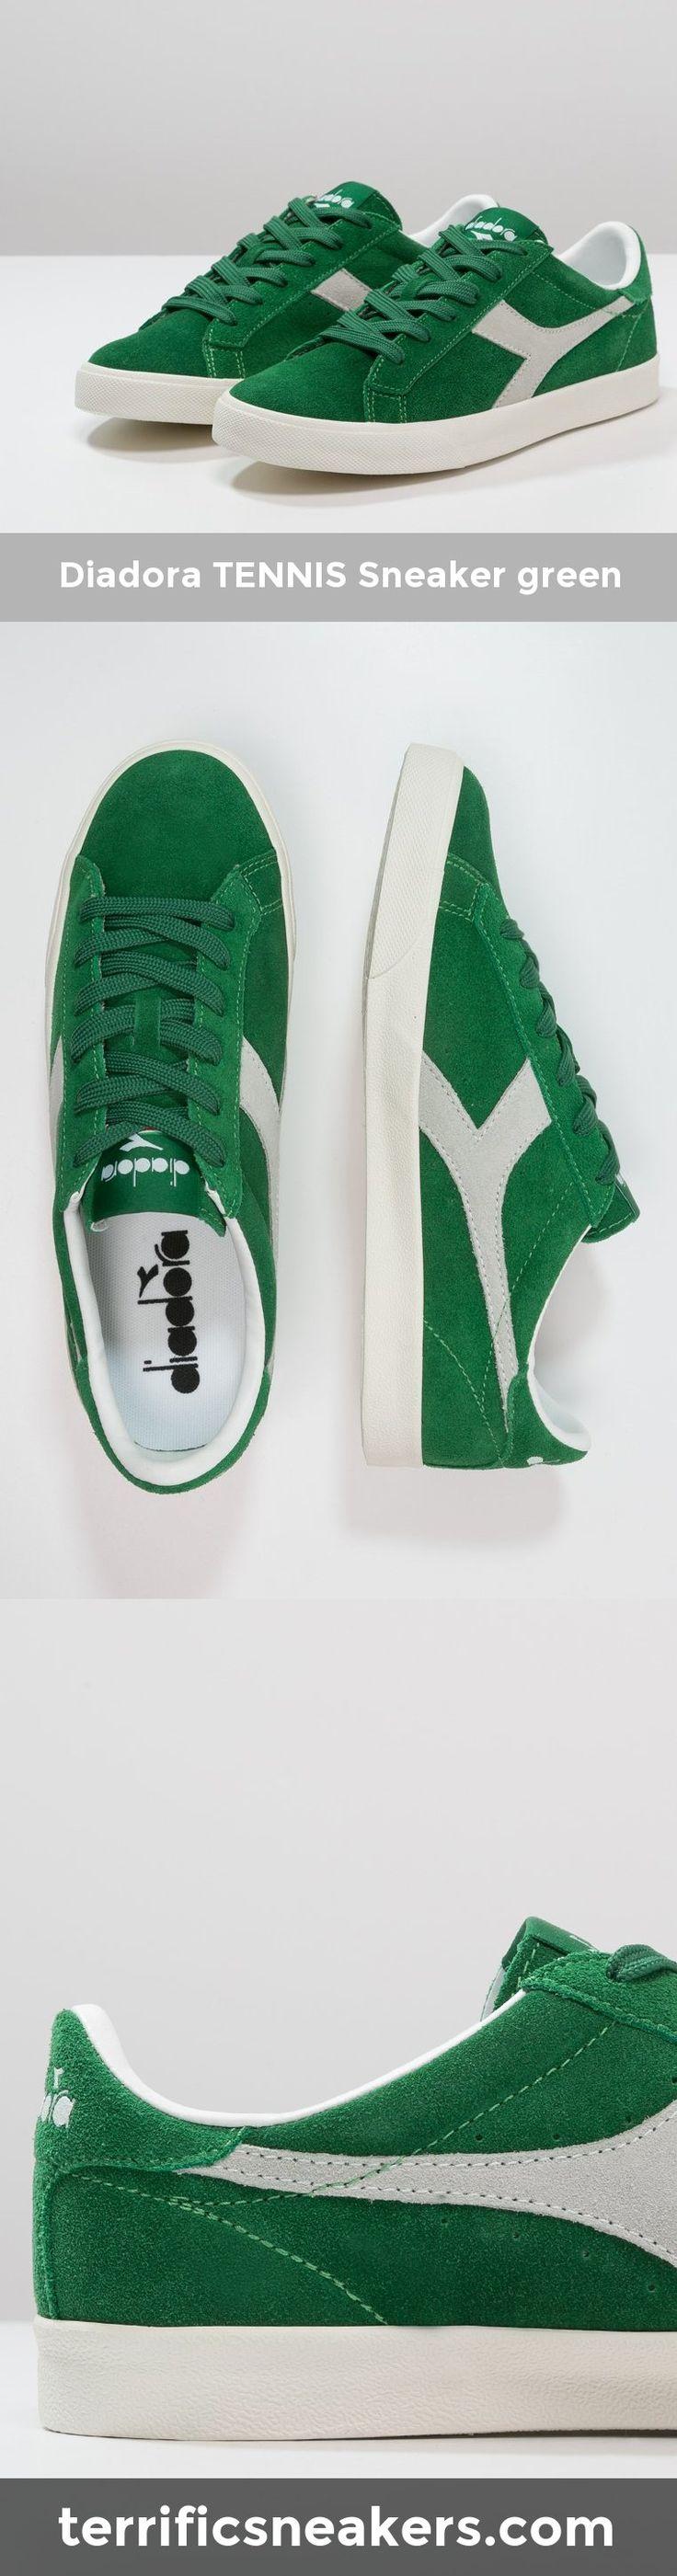 awesomeness... Diadora TENNIS Sneaker green #Sneakers